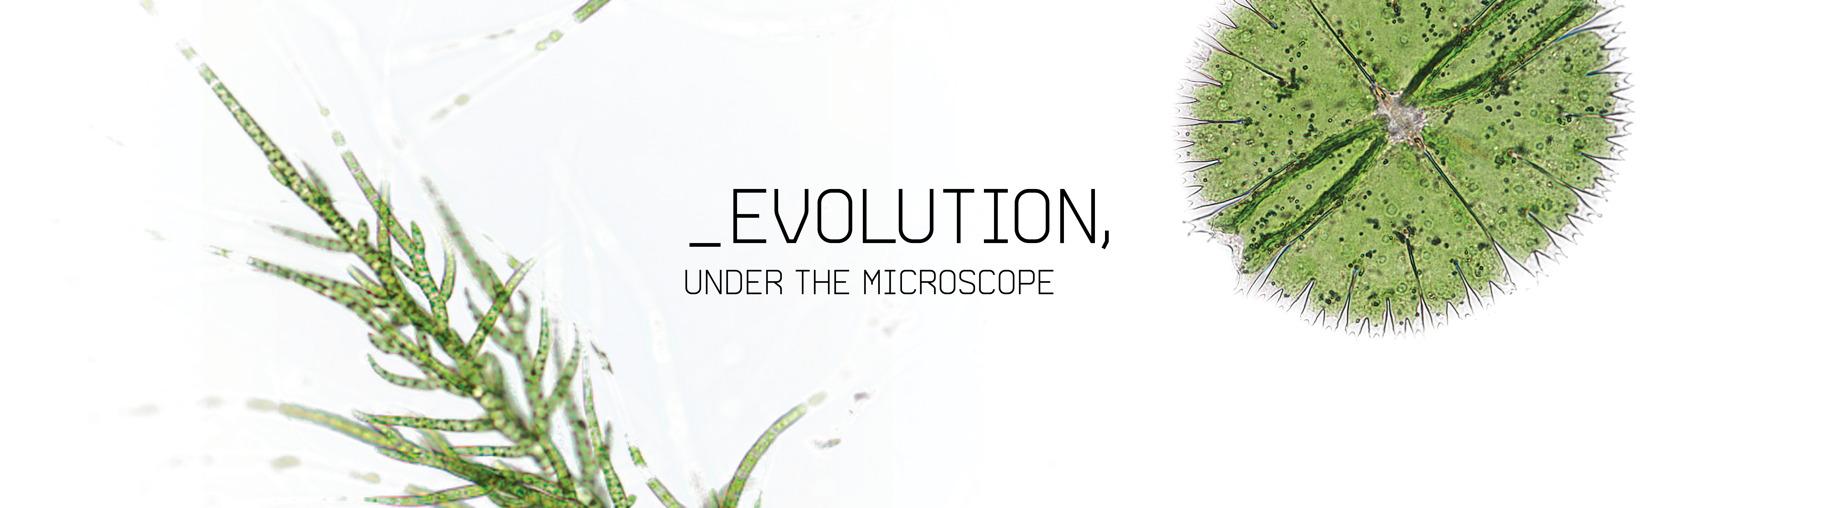 Evolution, Under the Microscope